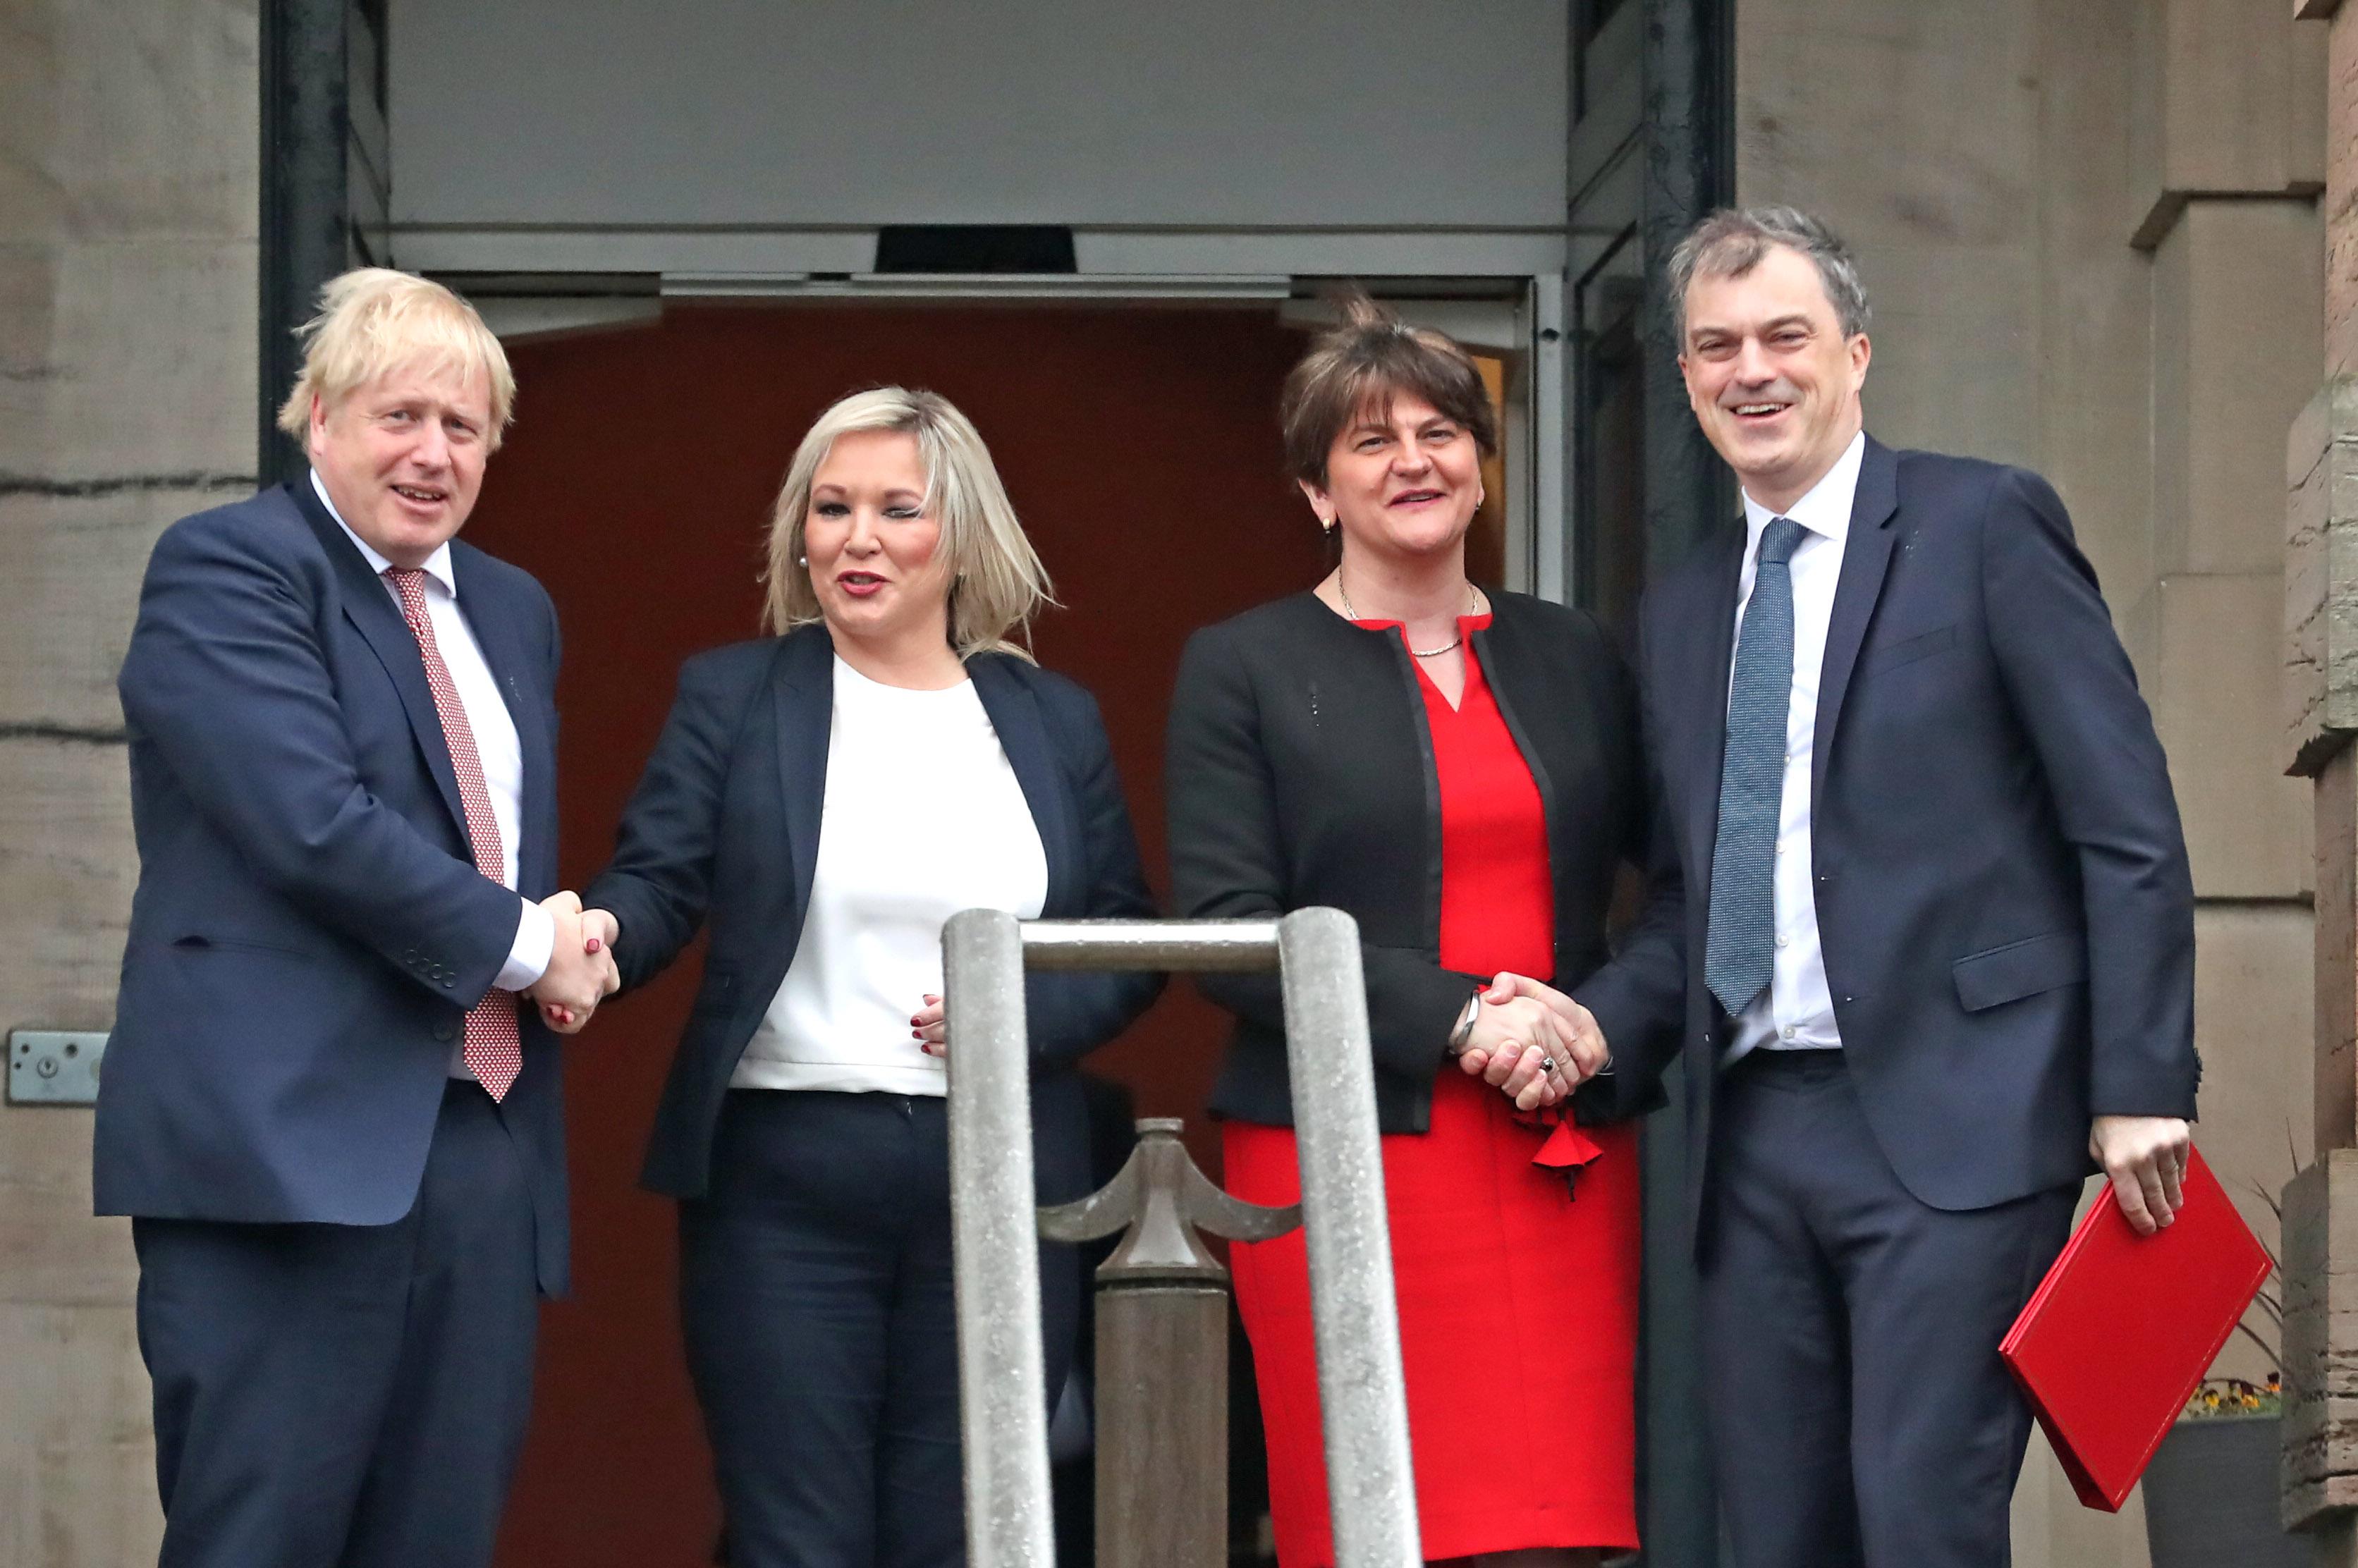 Boris Johnson, Arlene Foster, Michelle O'Neill and Julian Smith